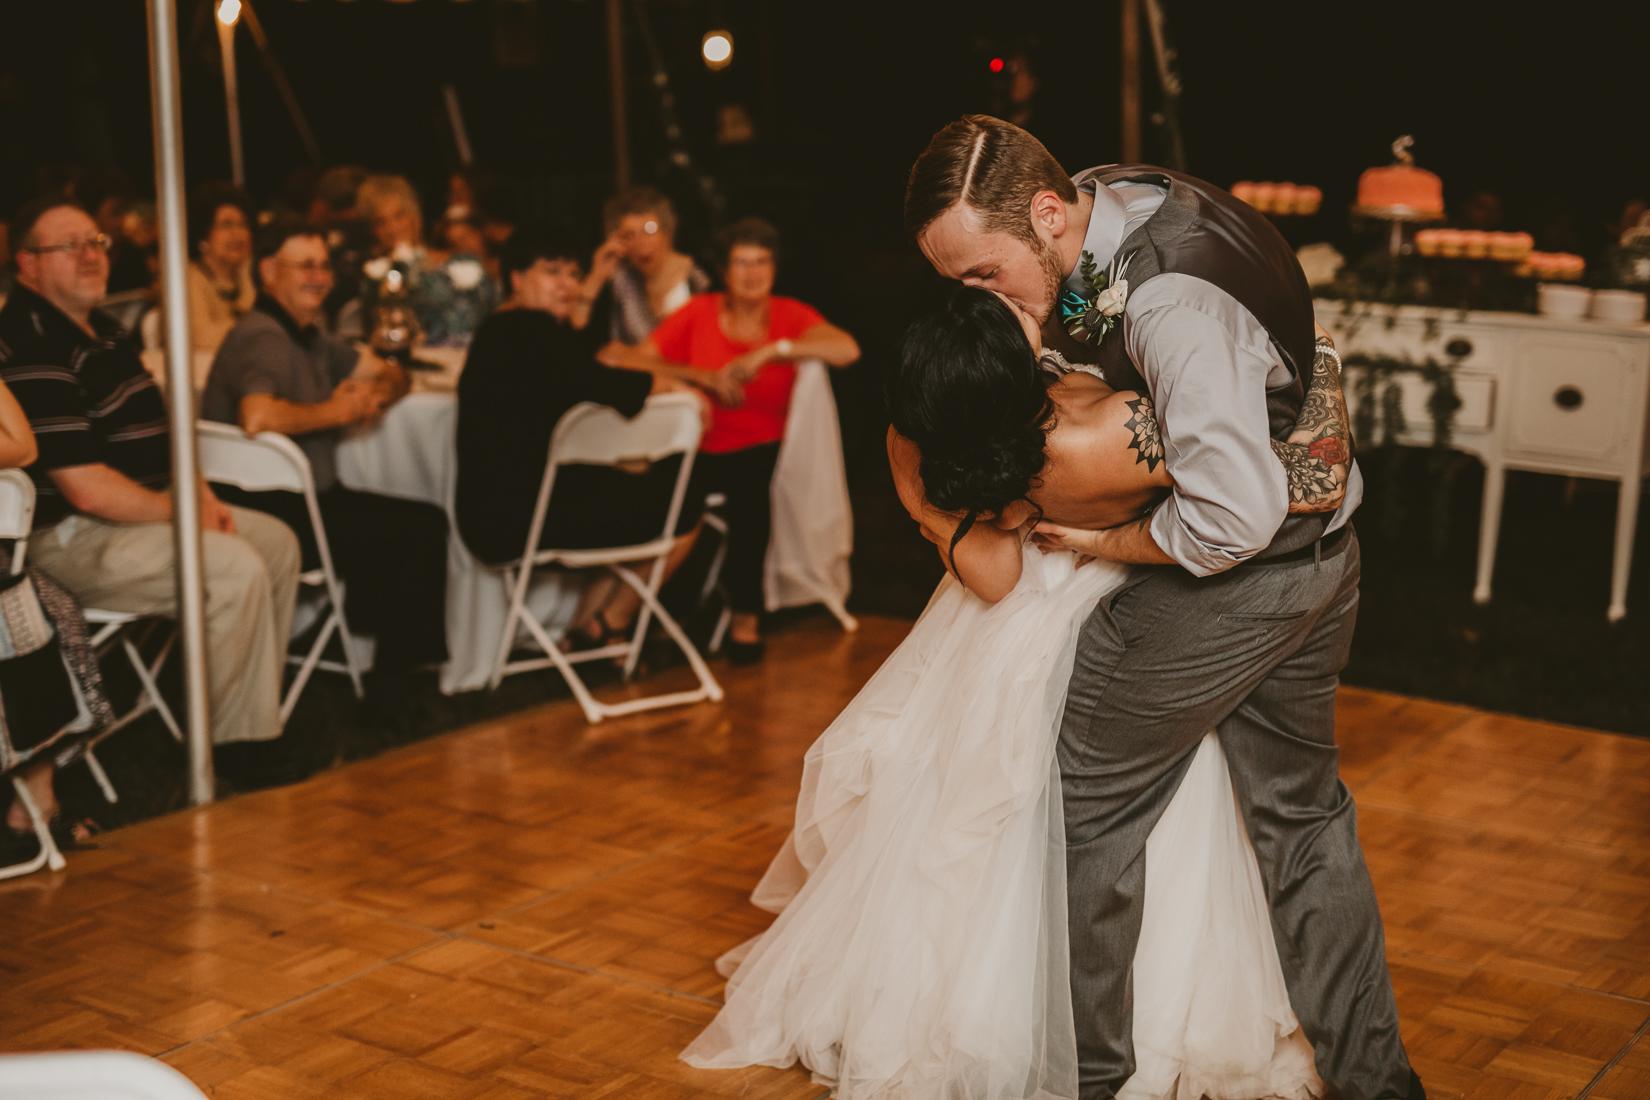 olivia_zay_wedding_09_2018-9855.jpg